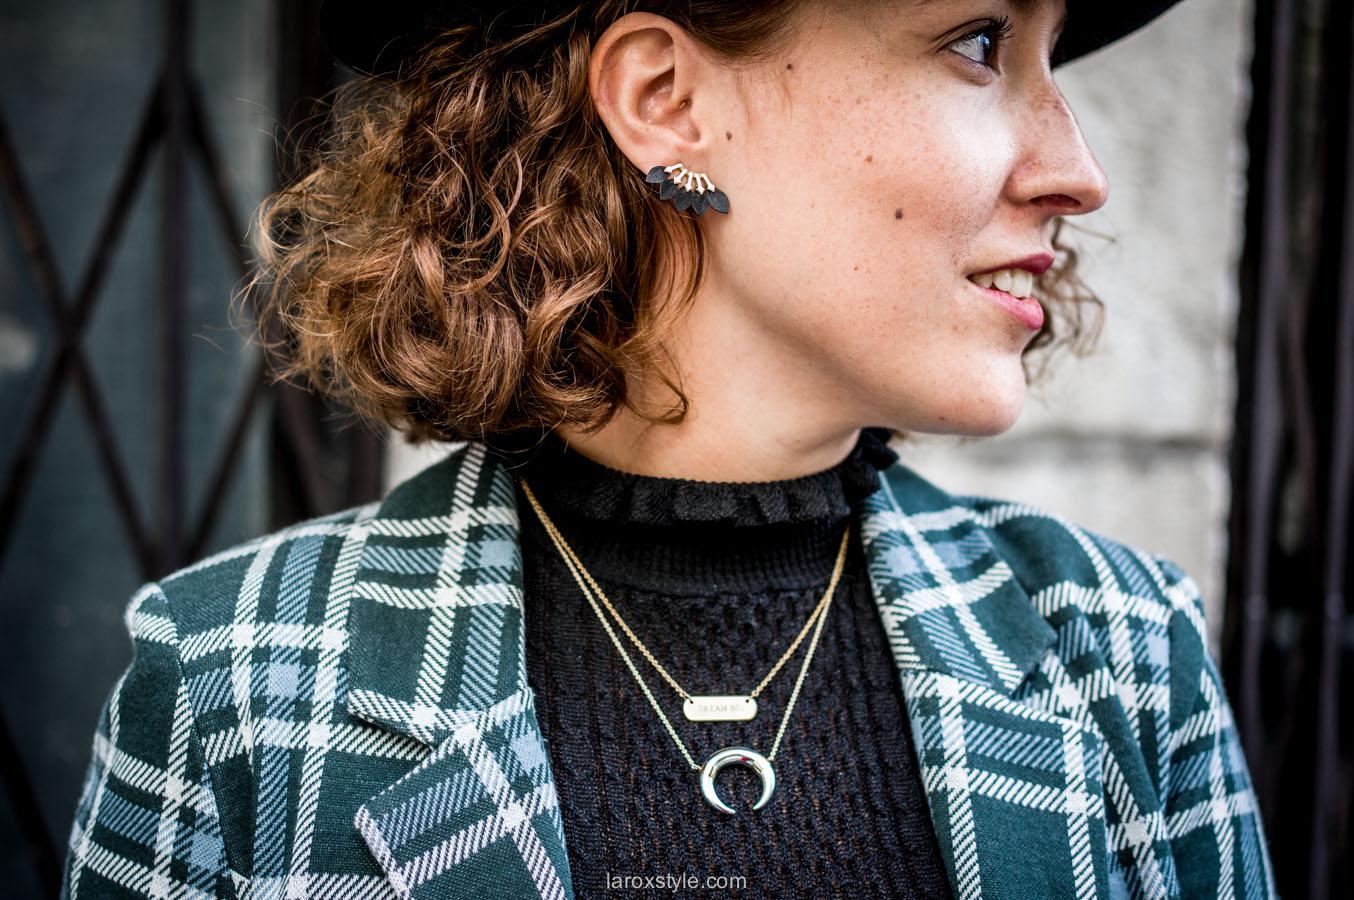 bijoux stella and dot - laroxstyle - blog mode